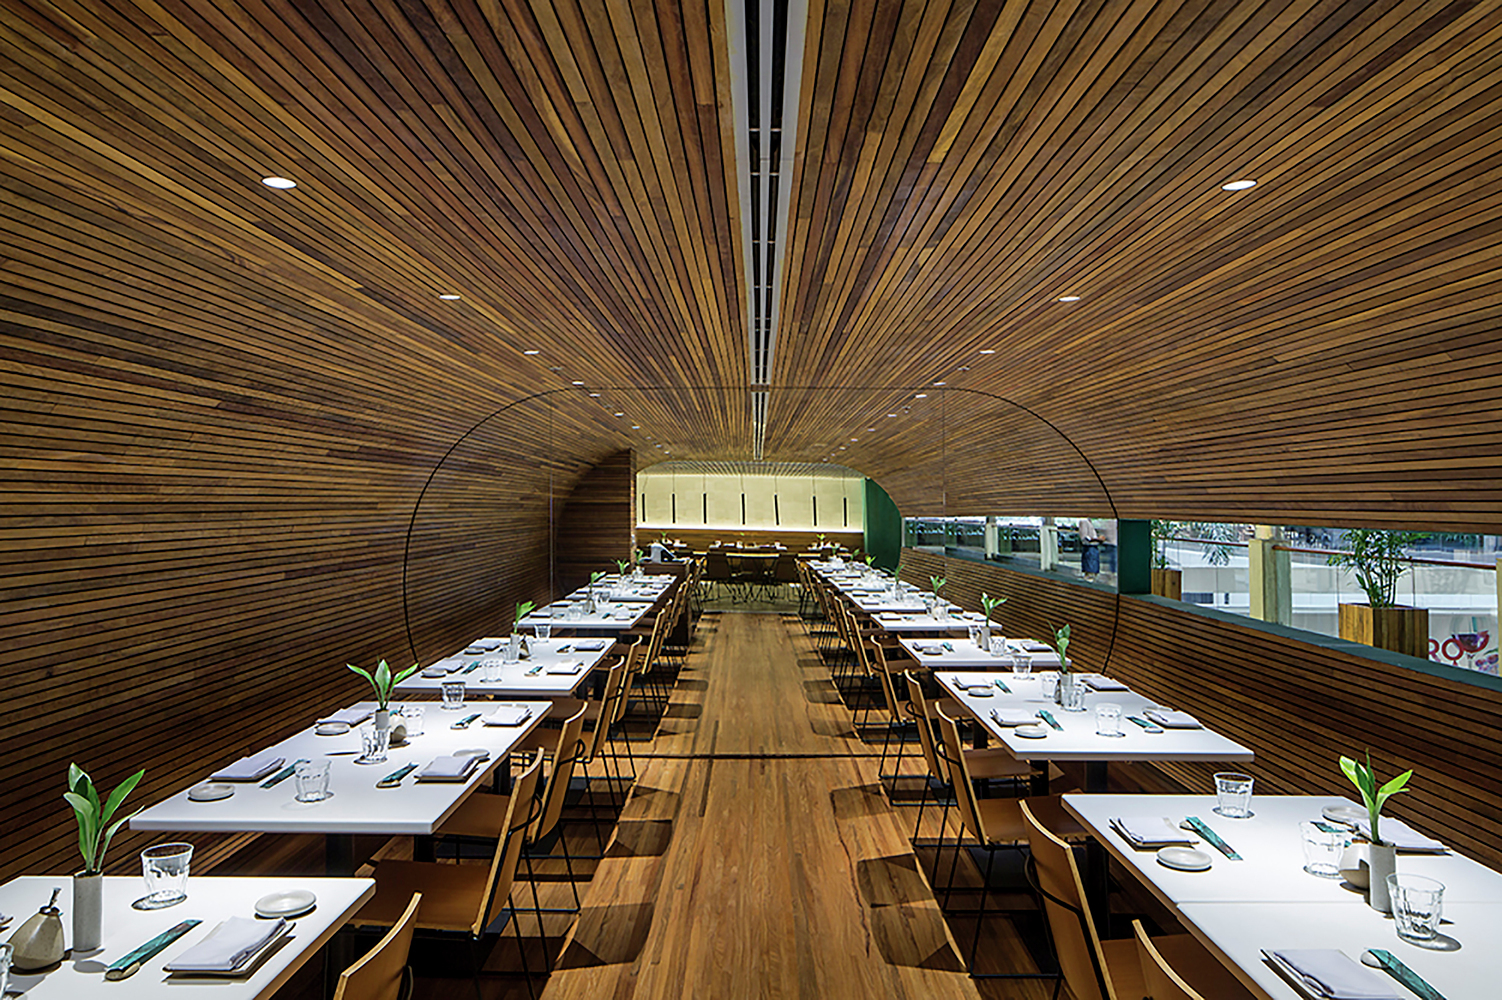 Sushi Bar Designs: 10 Restaurant Interiors Around the World